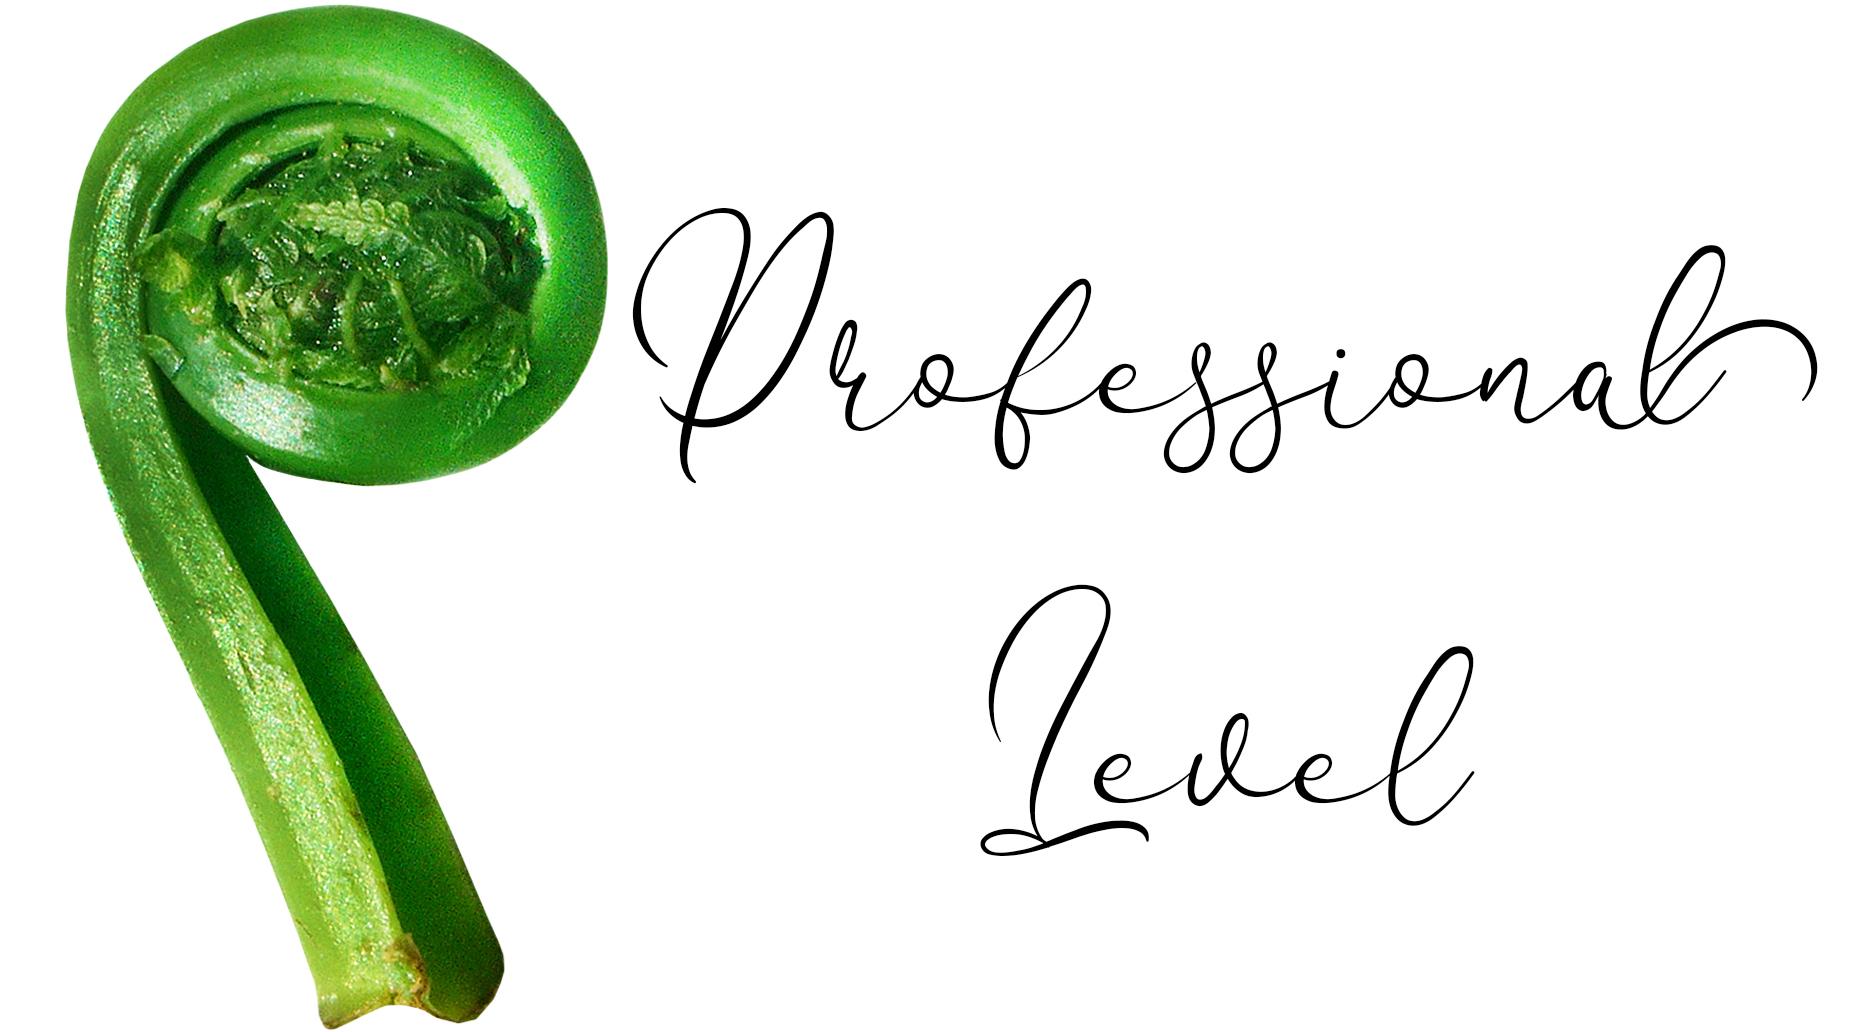 Master & Professional Level